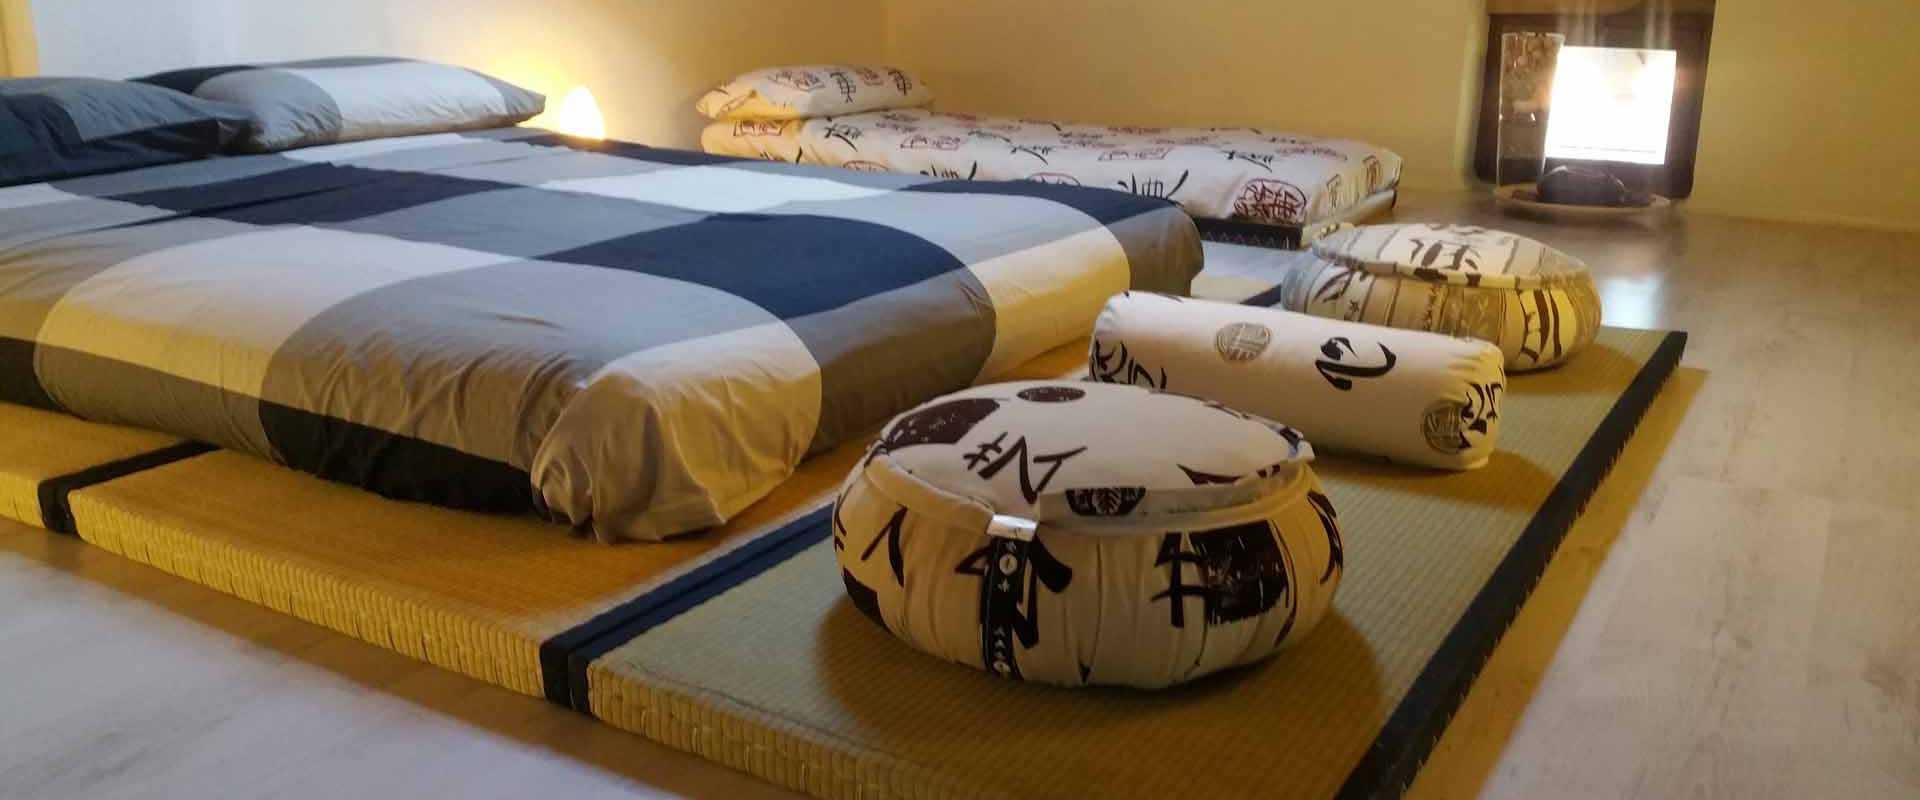 Camera zen tre posti letto tatami futon B&B & Meditation Center Zorba ll Buddha Passerano Marmorito Asti